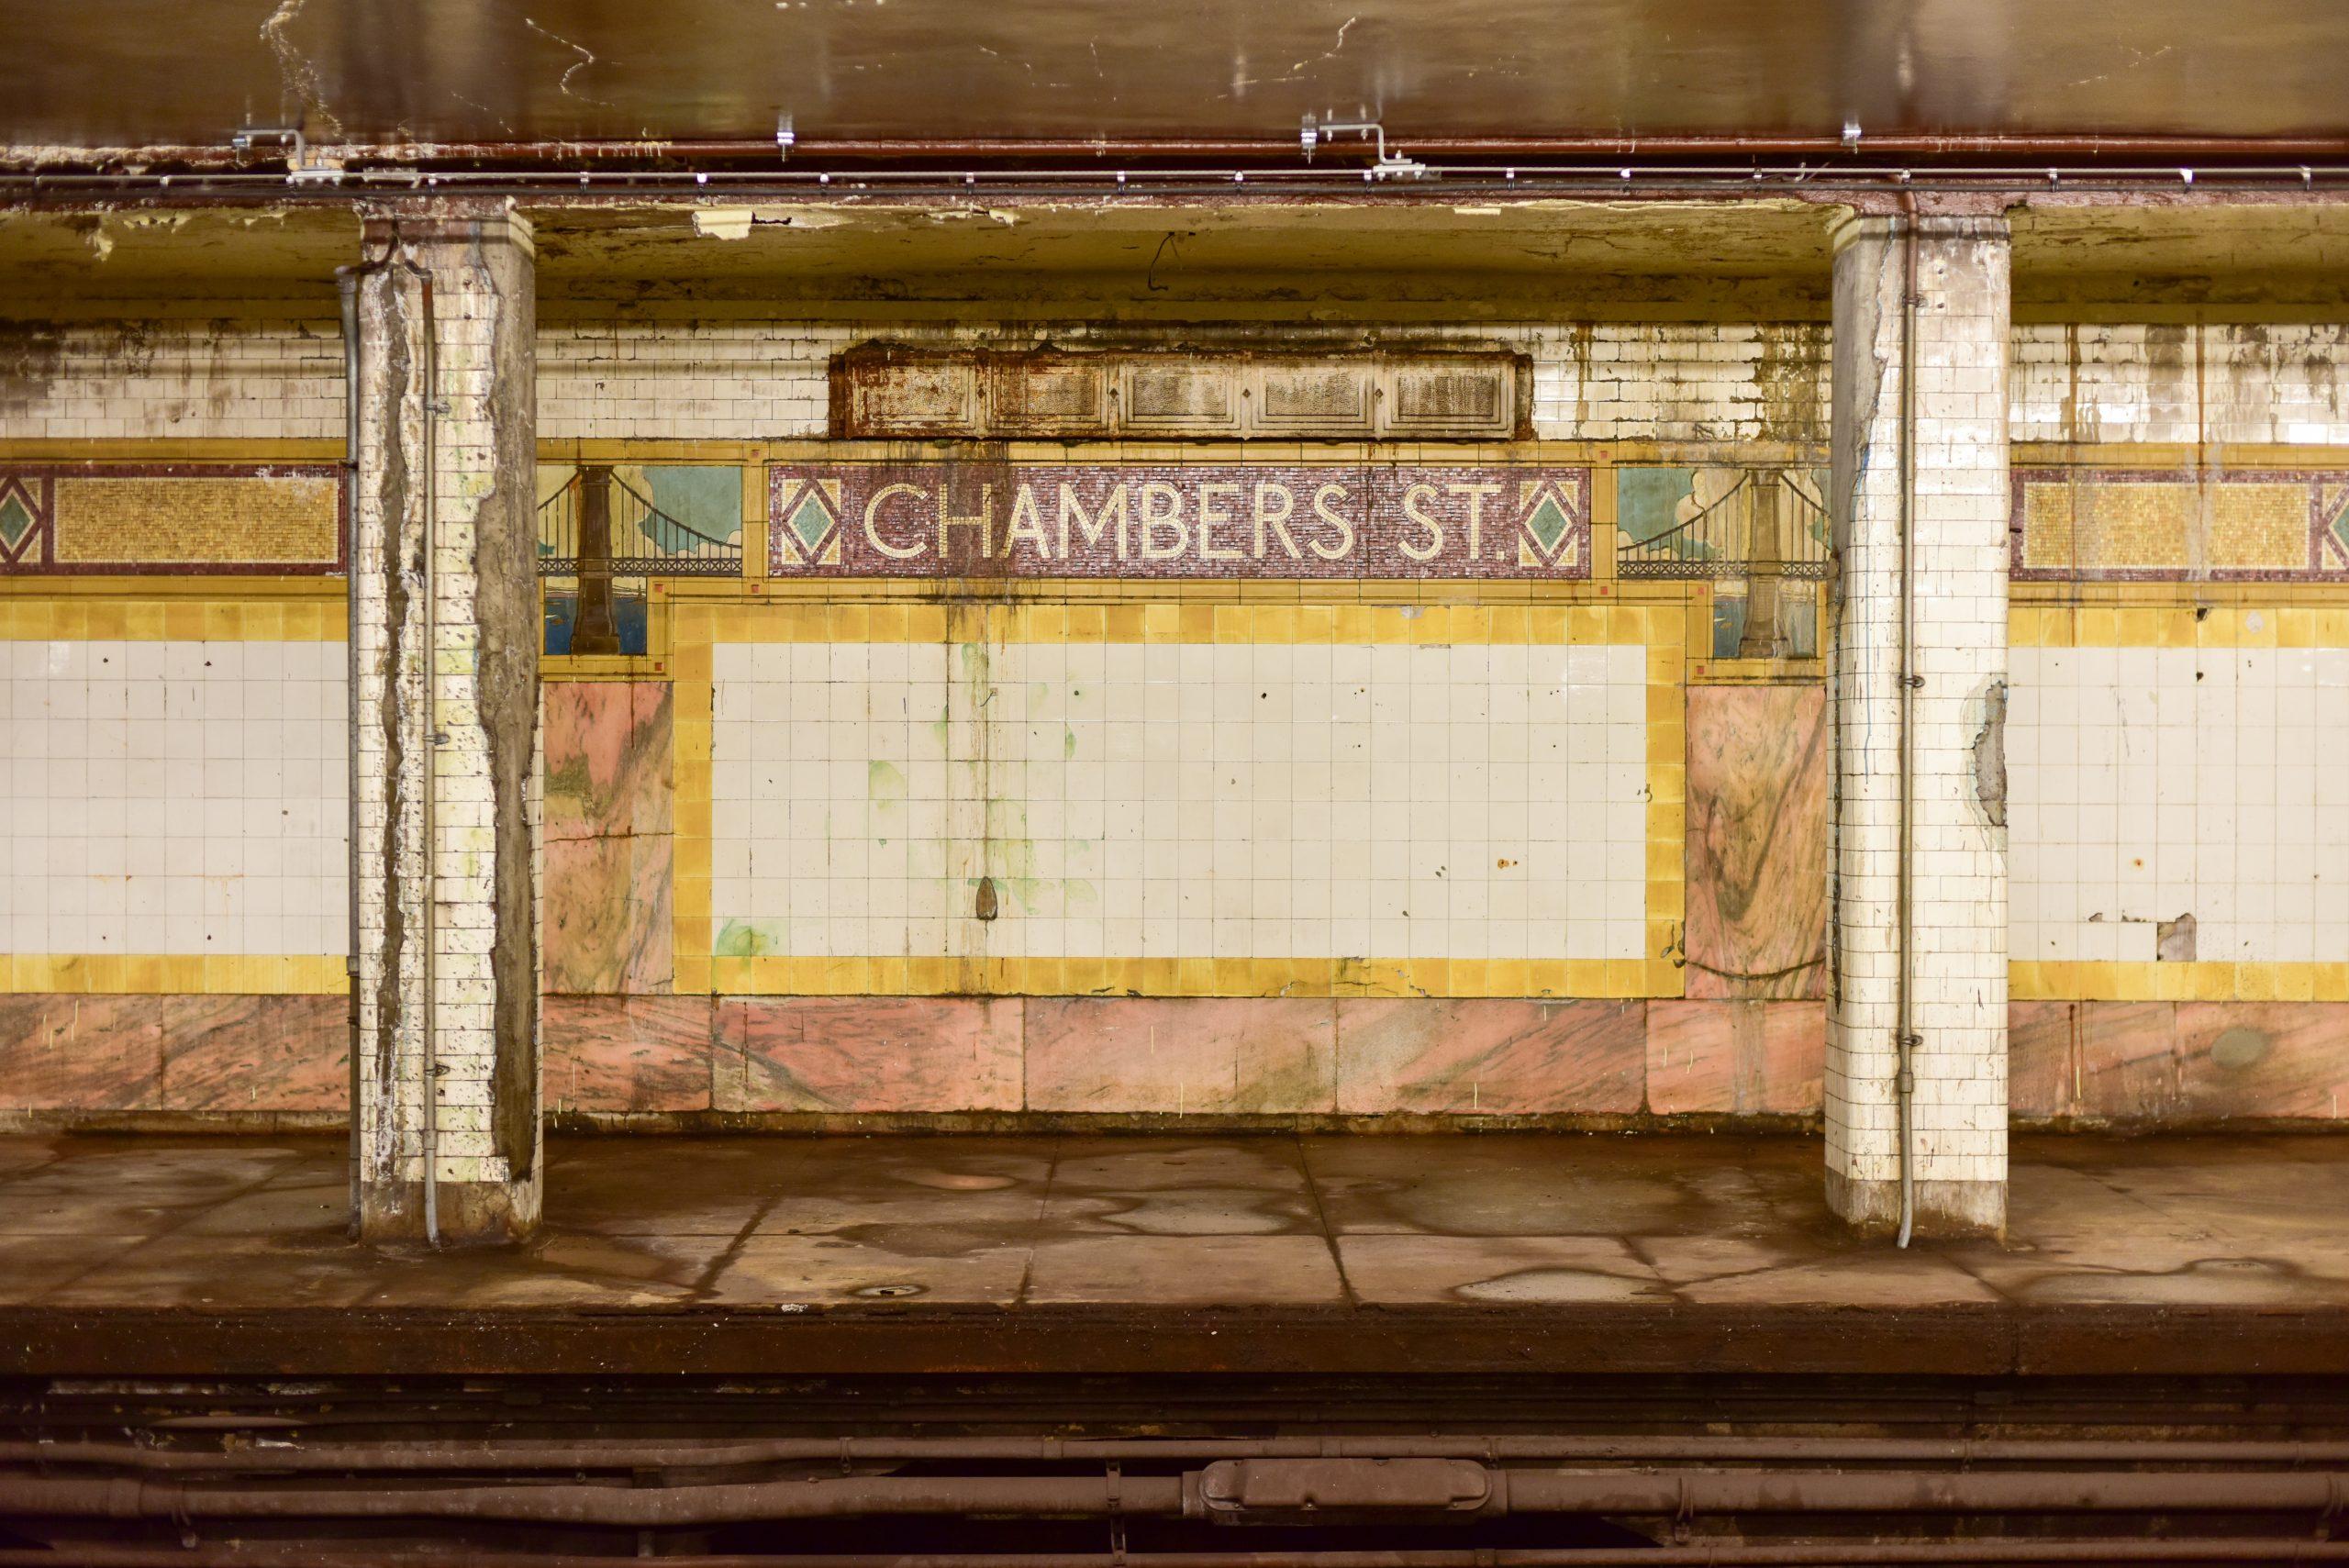 Chambers St